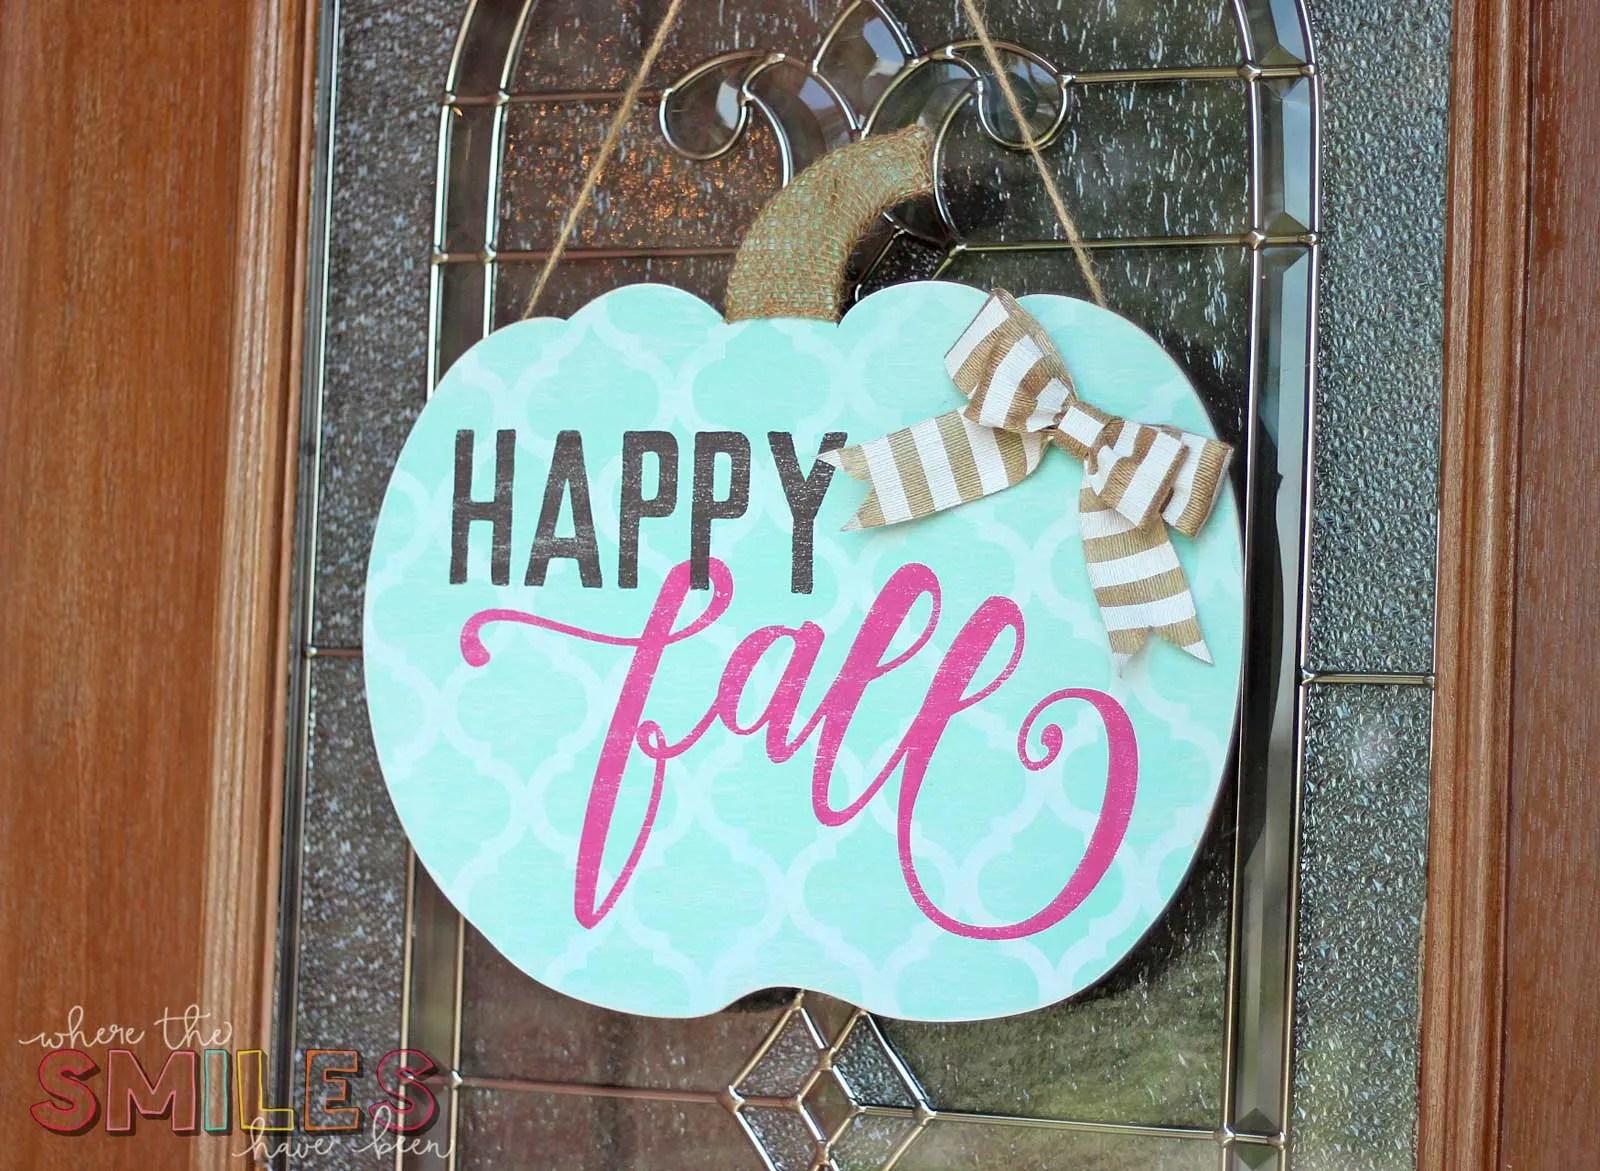 Happy Fall Pumpkin Door Hanger: My Girl Gourd | Where The Smiles Have Been #Fall #wreath #pumpkin